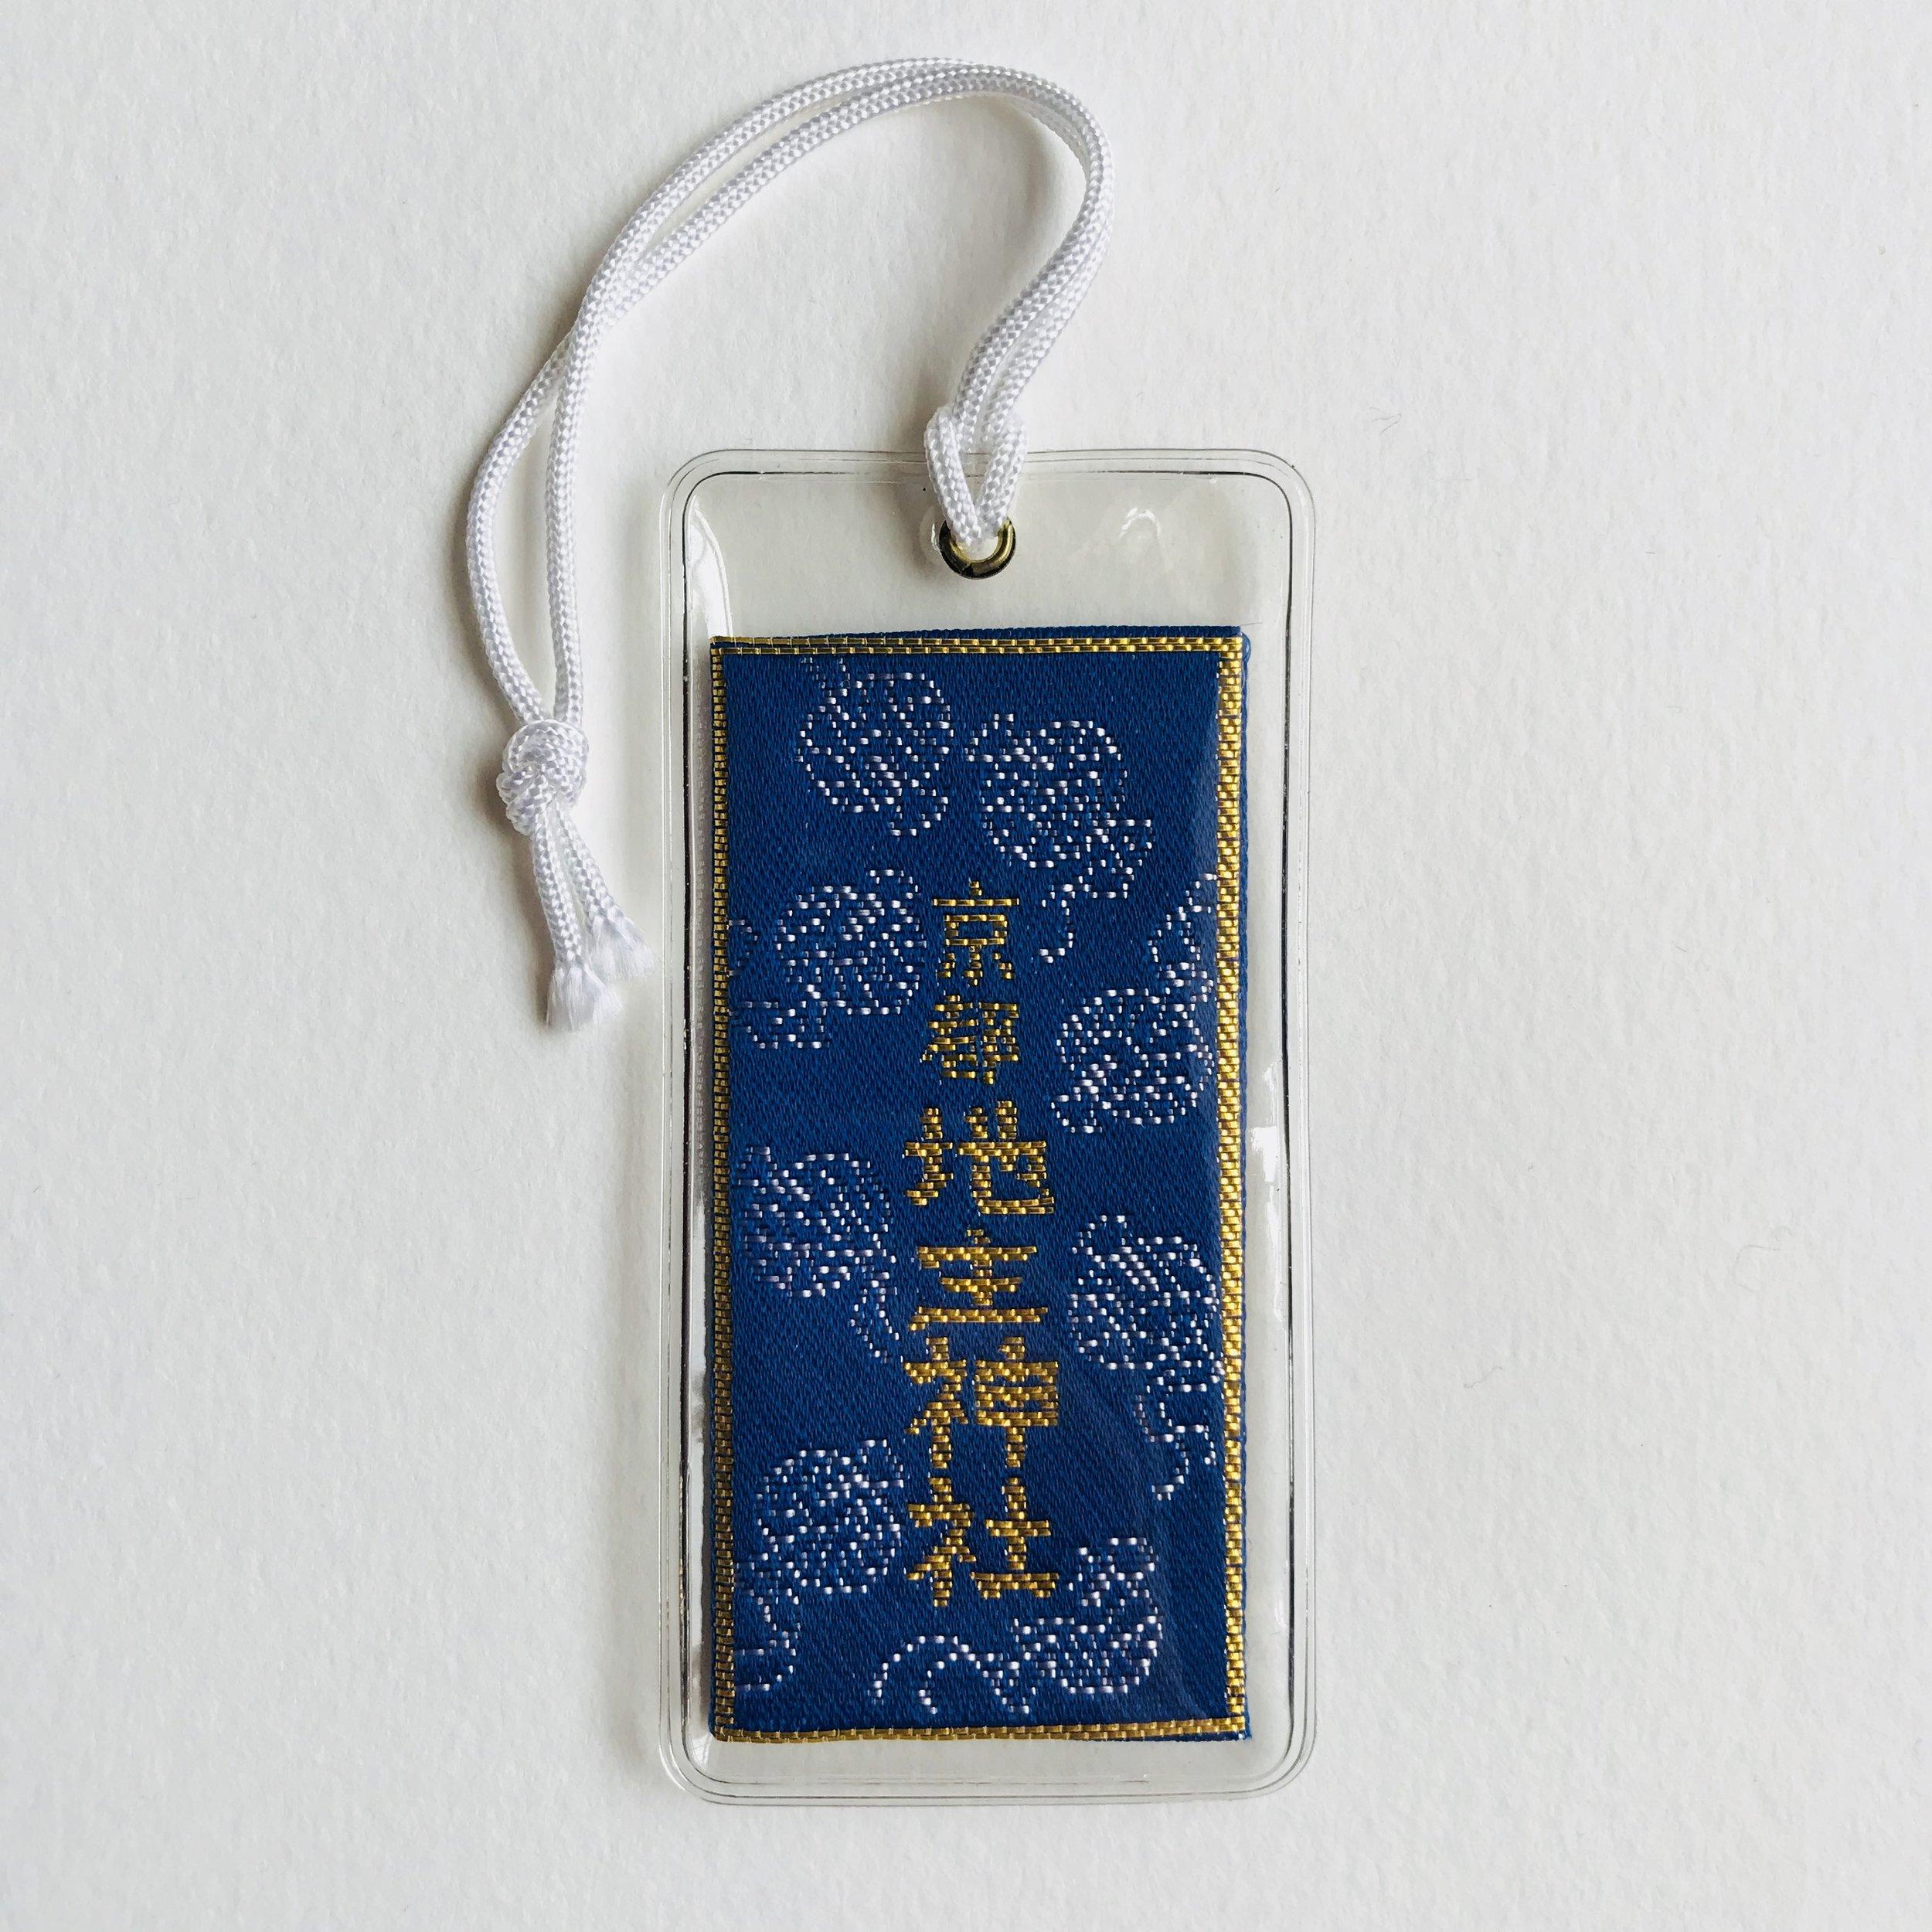 Jishu Jinja 地主神社